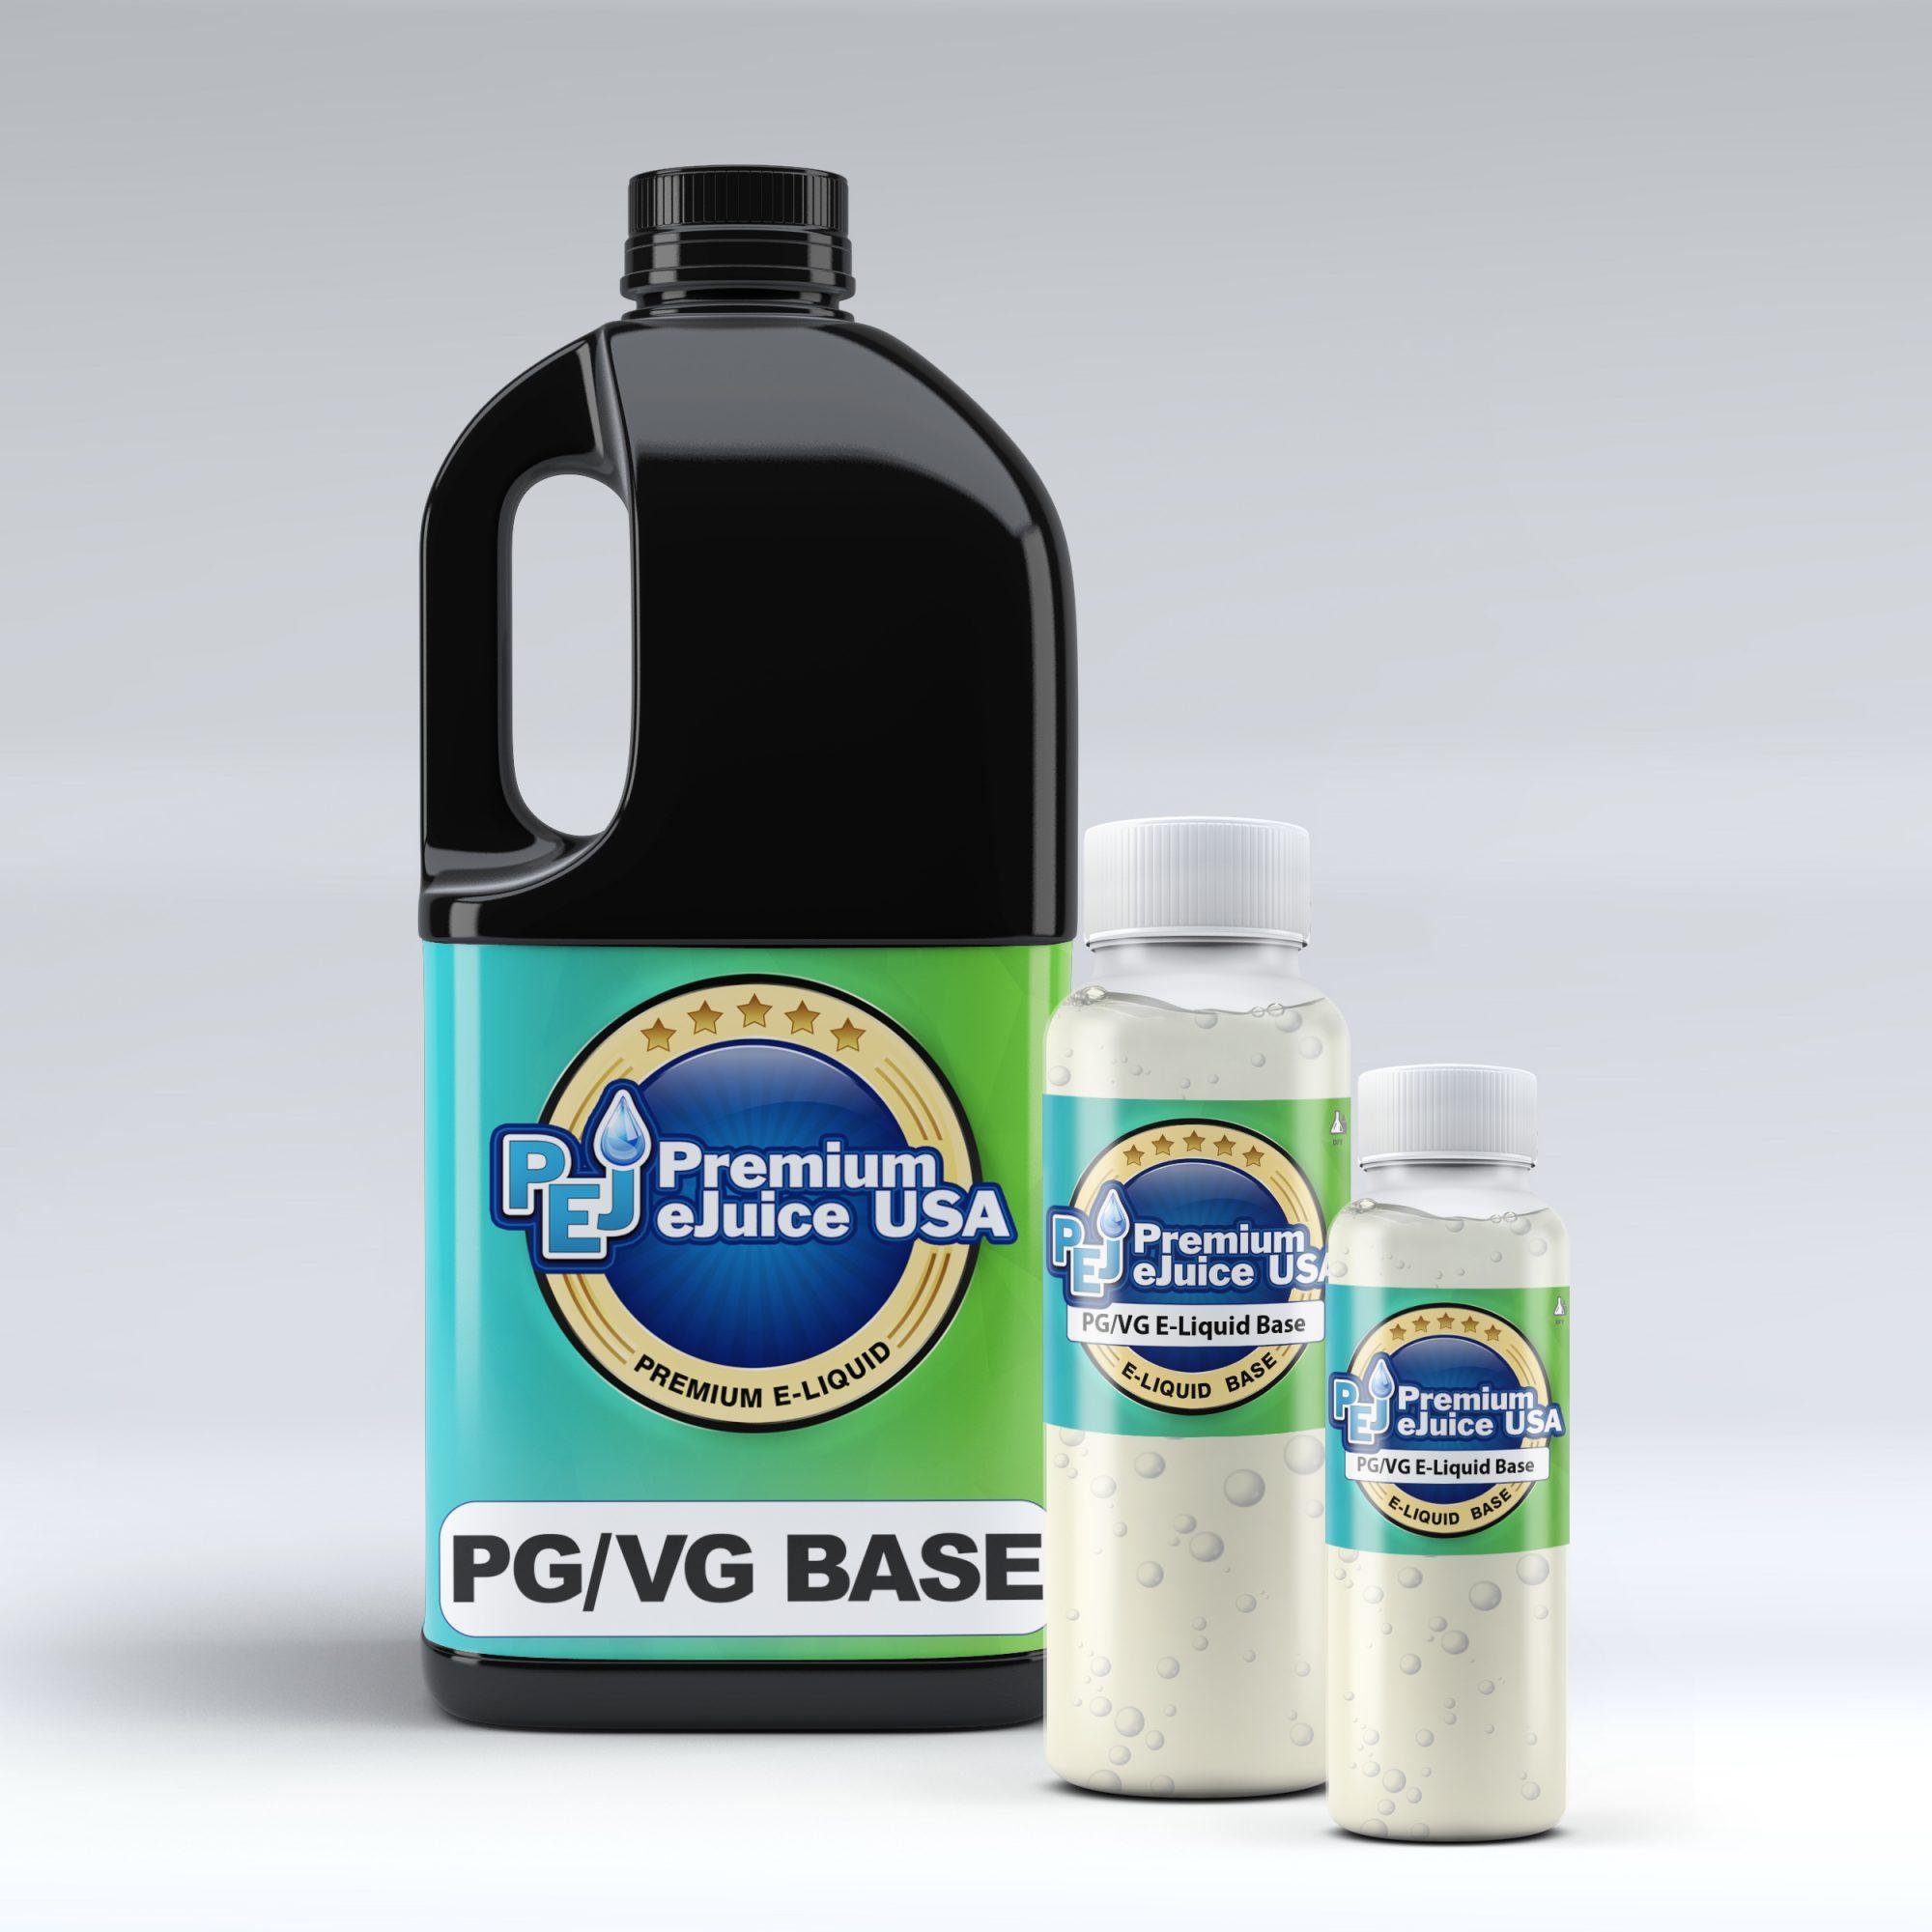 pgvg_plastic_jug_and_bottles.jpg